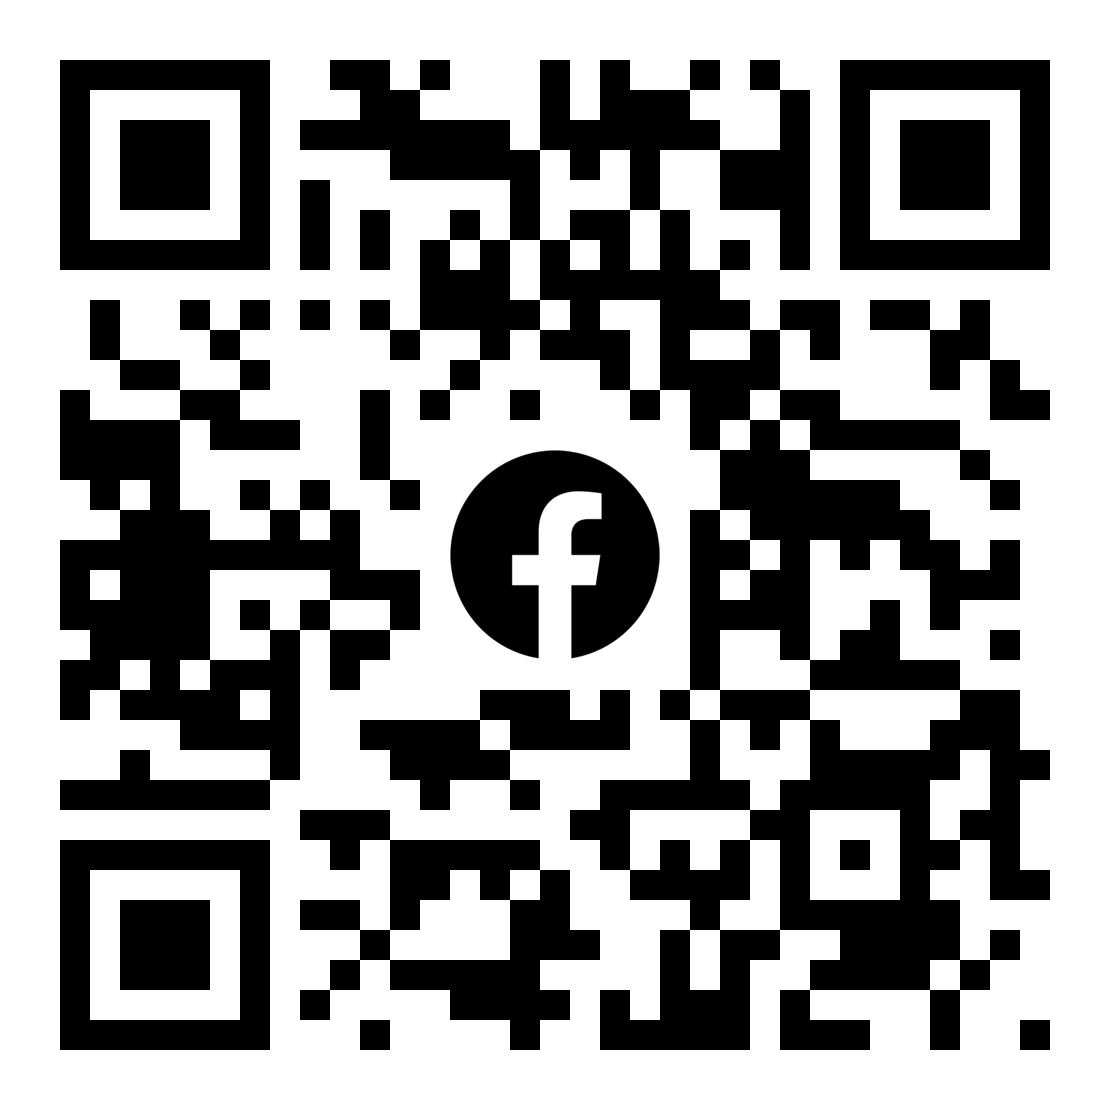 119236608_321202705759151_5735279375045424519_n